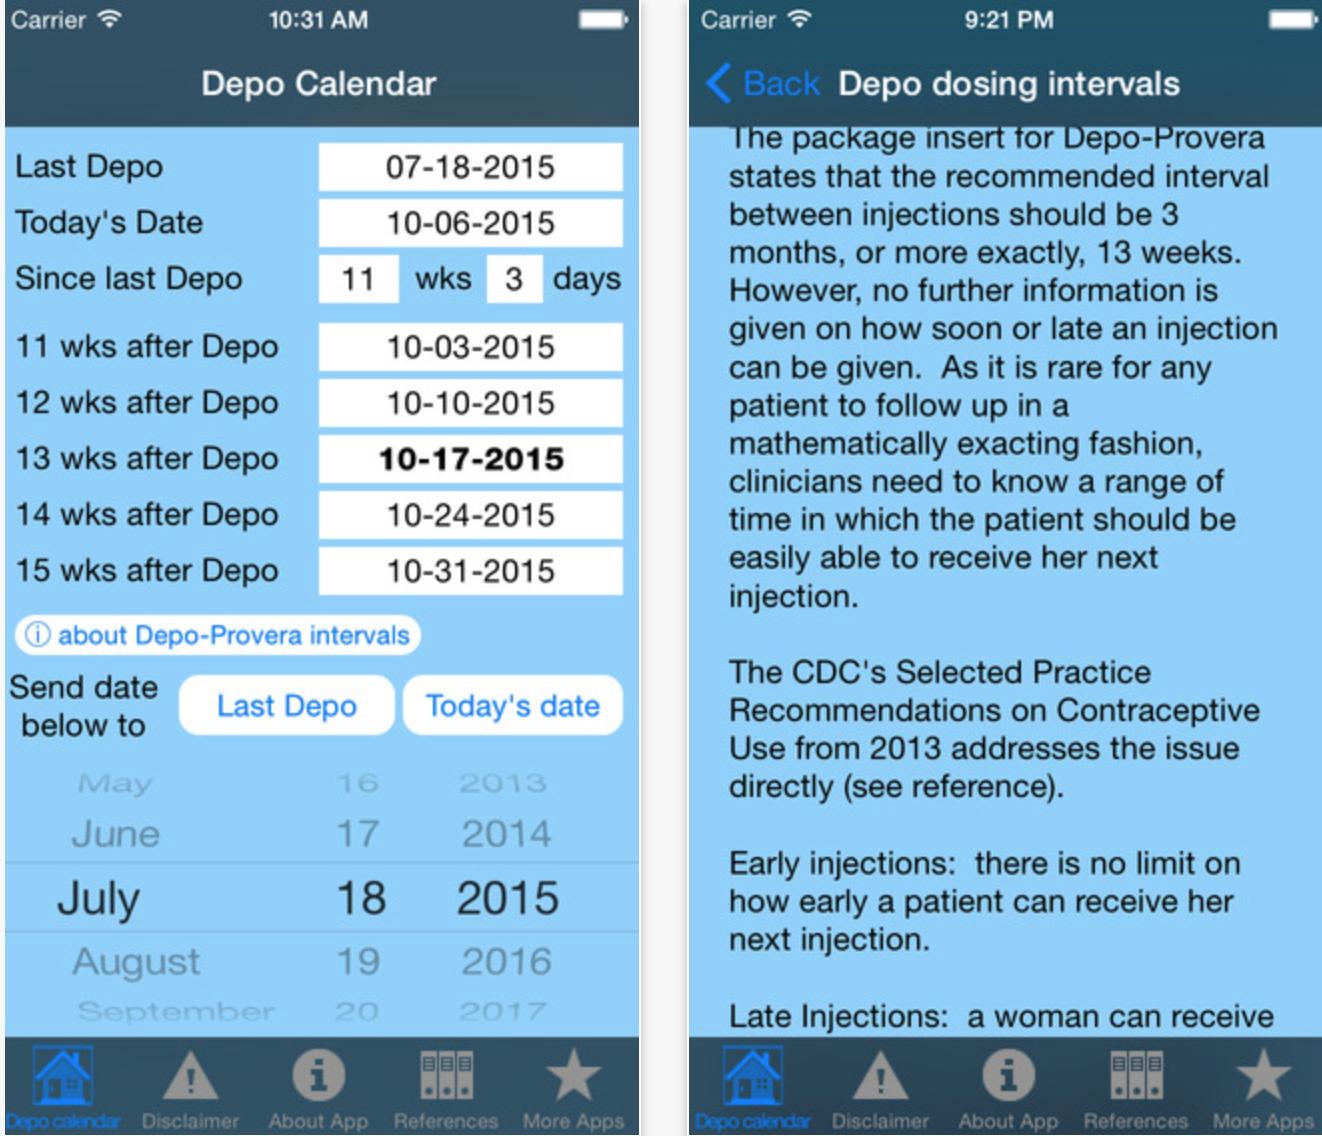 Depo Calendar App Could Significantly Improve Contraception inside Depo Provera Calendar 2020